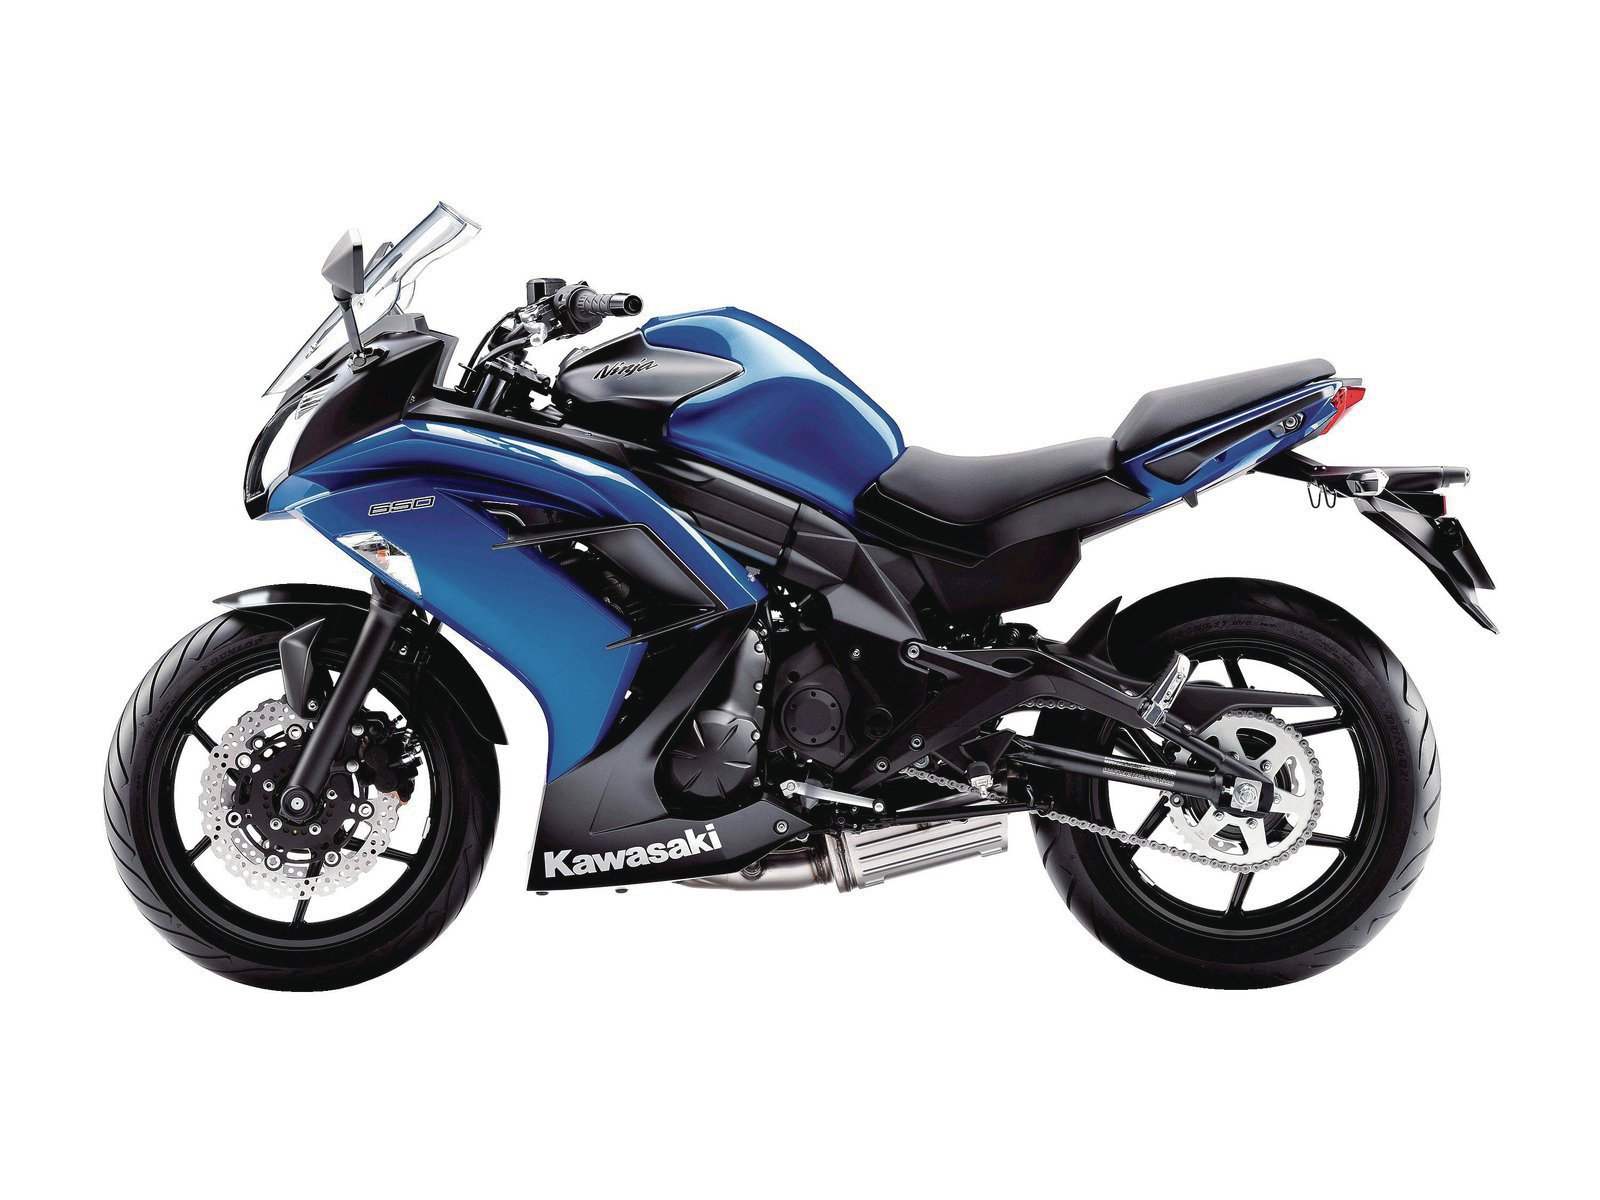 kawasaki motor bikes 2013 kawasaki ninja 650 abs. Black Bedroom Furniture Sets. Home Design Ideas